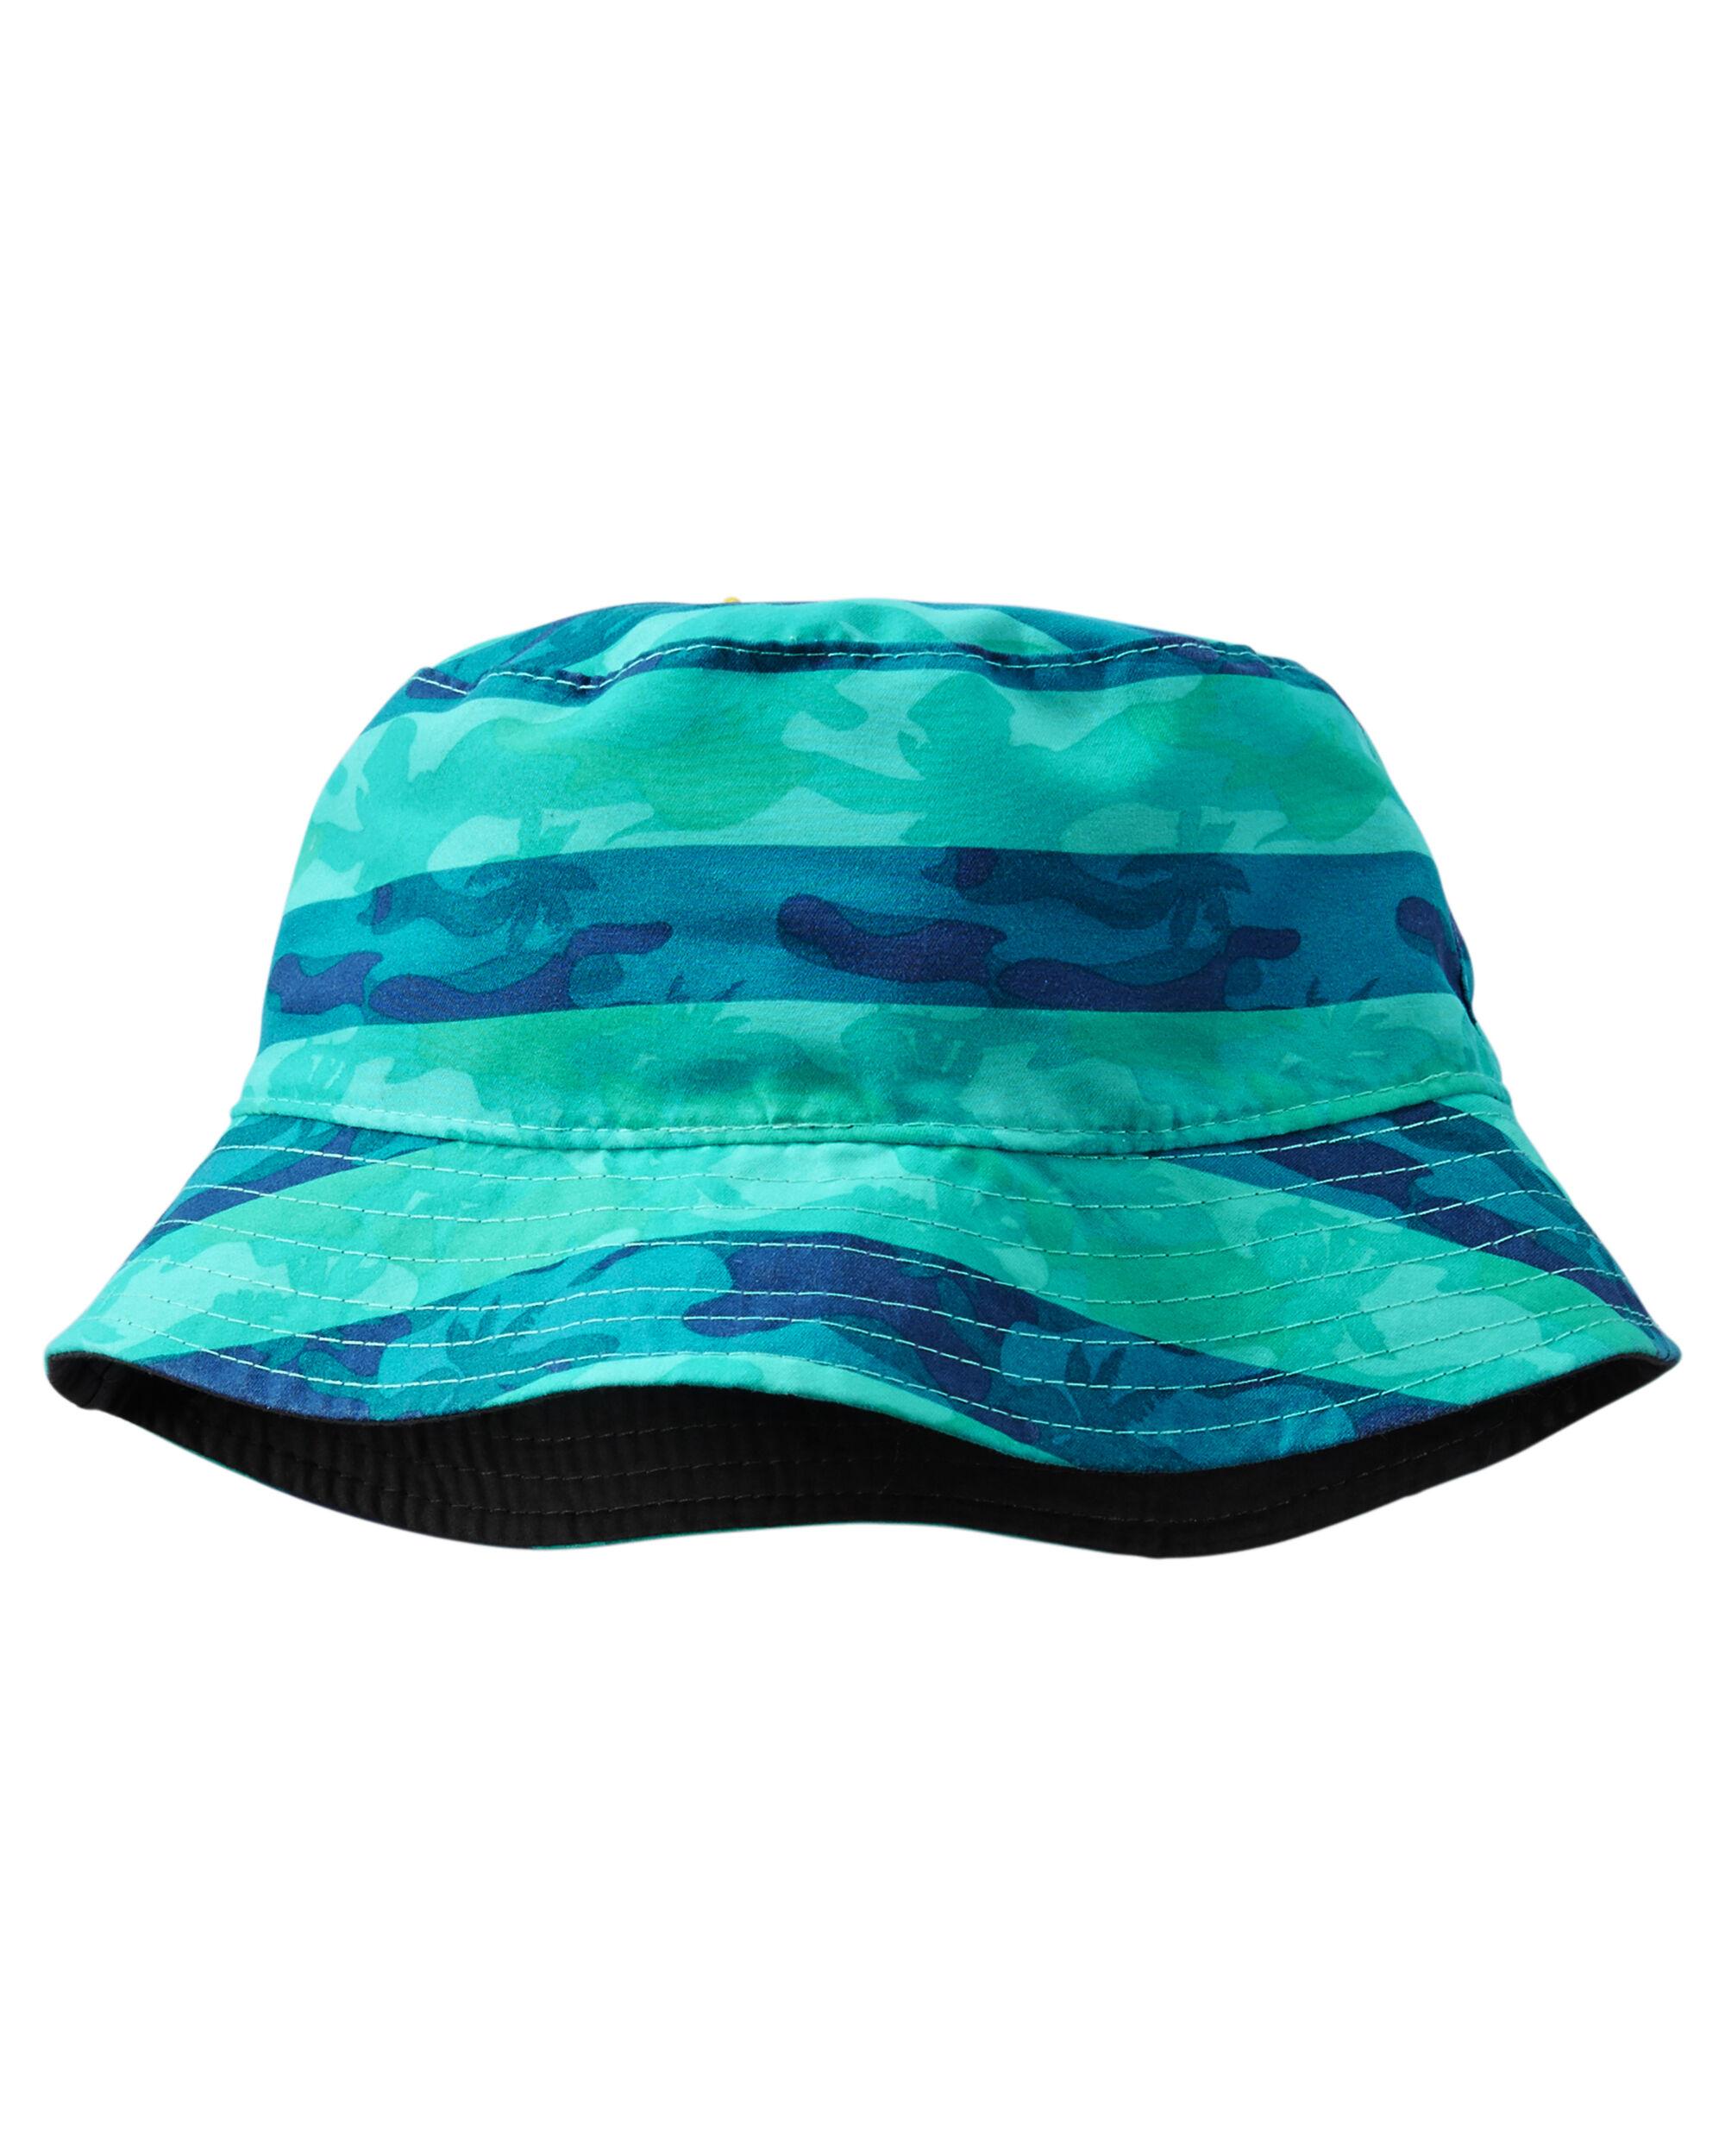 812a8fd3 Reversible Striped Camo Bucket Hat | OshKosh.com